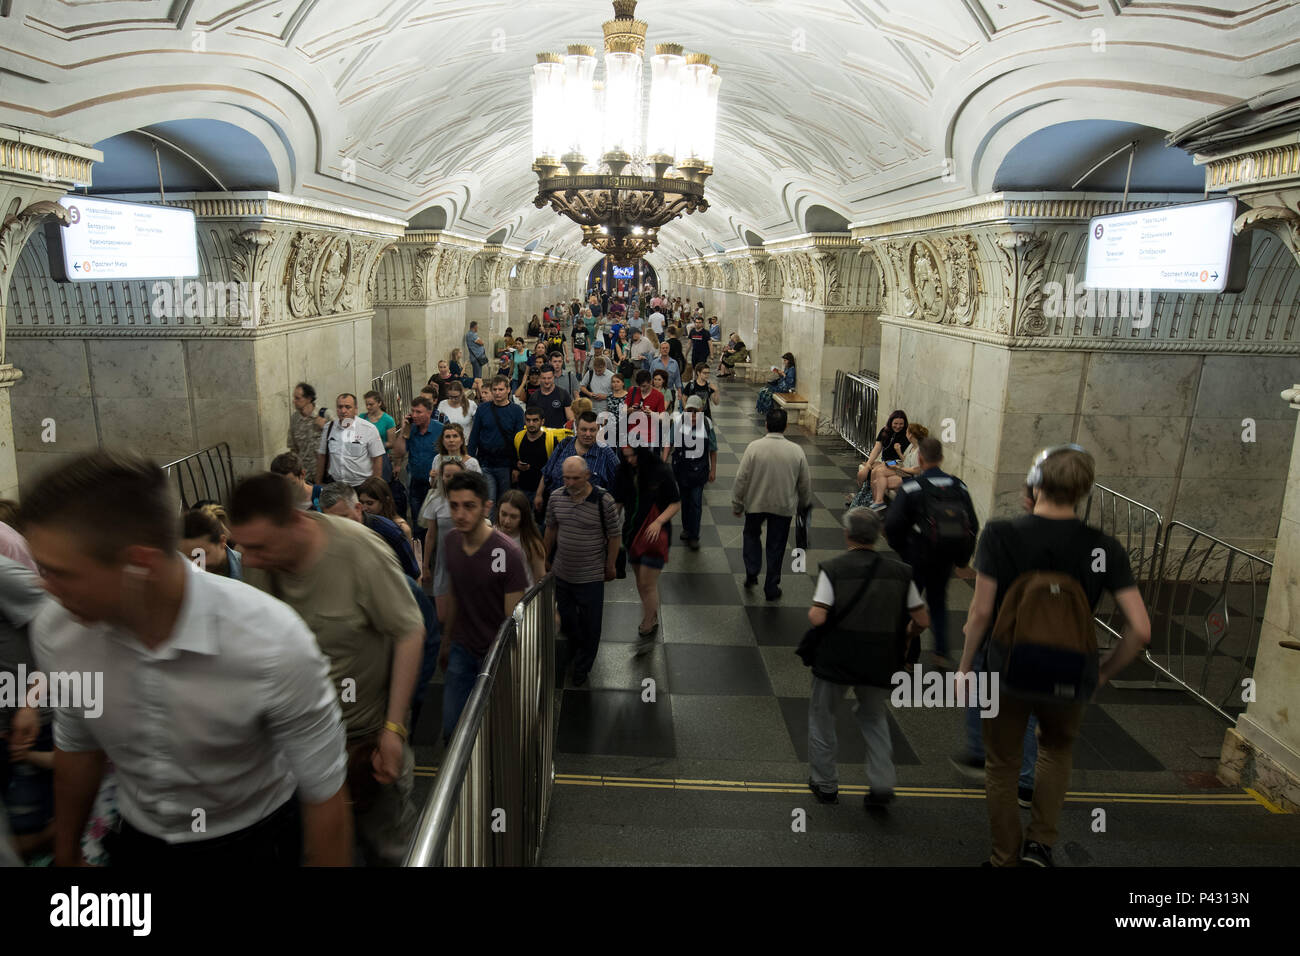 Moscow, Russia. 18th June, 2018. People walk around the Prospekt Mira metro station. Credit: Federico Gambarini/dpa/Alamy Live News - Stock Image